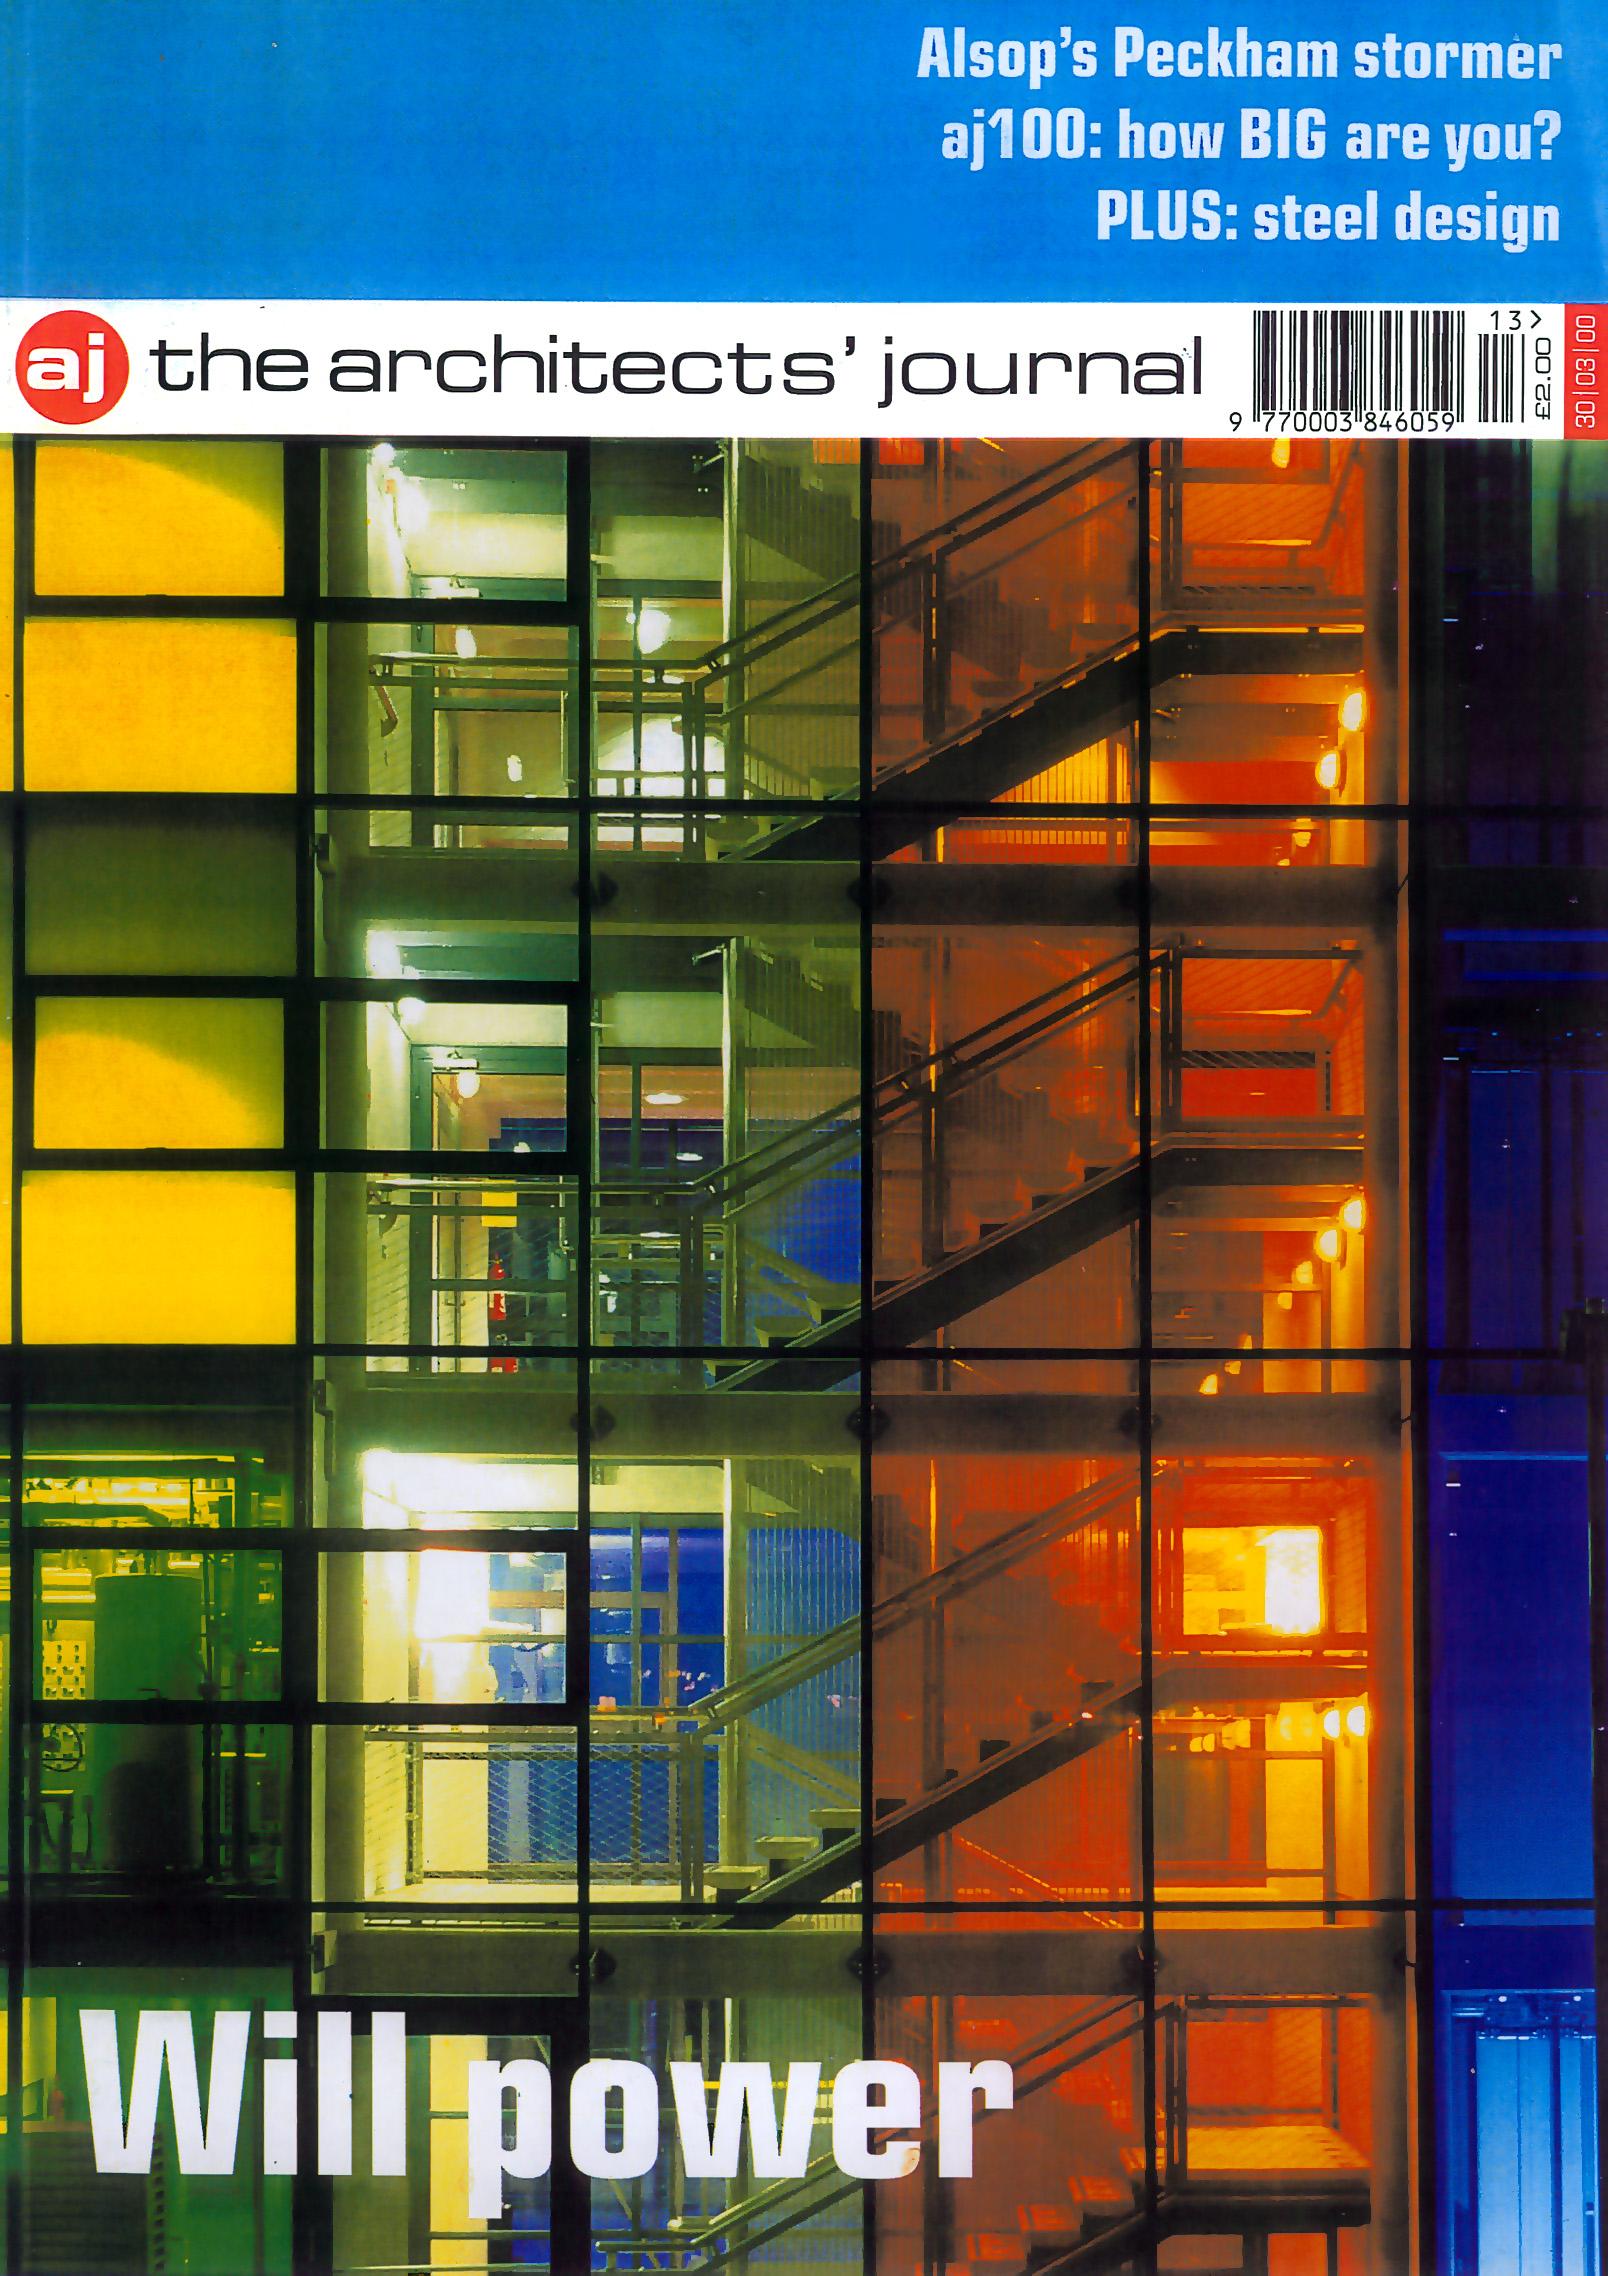 Architects Journal publication